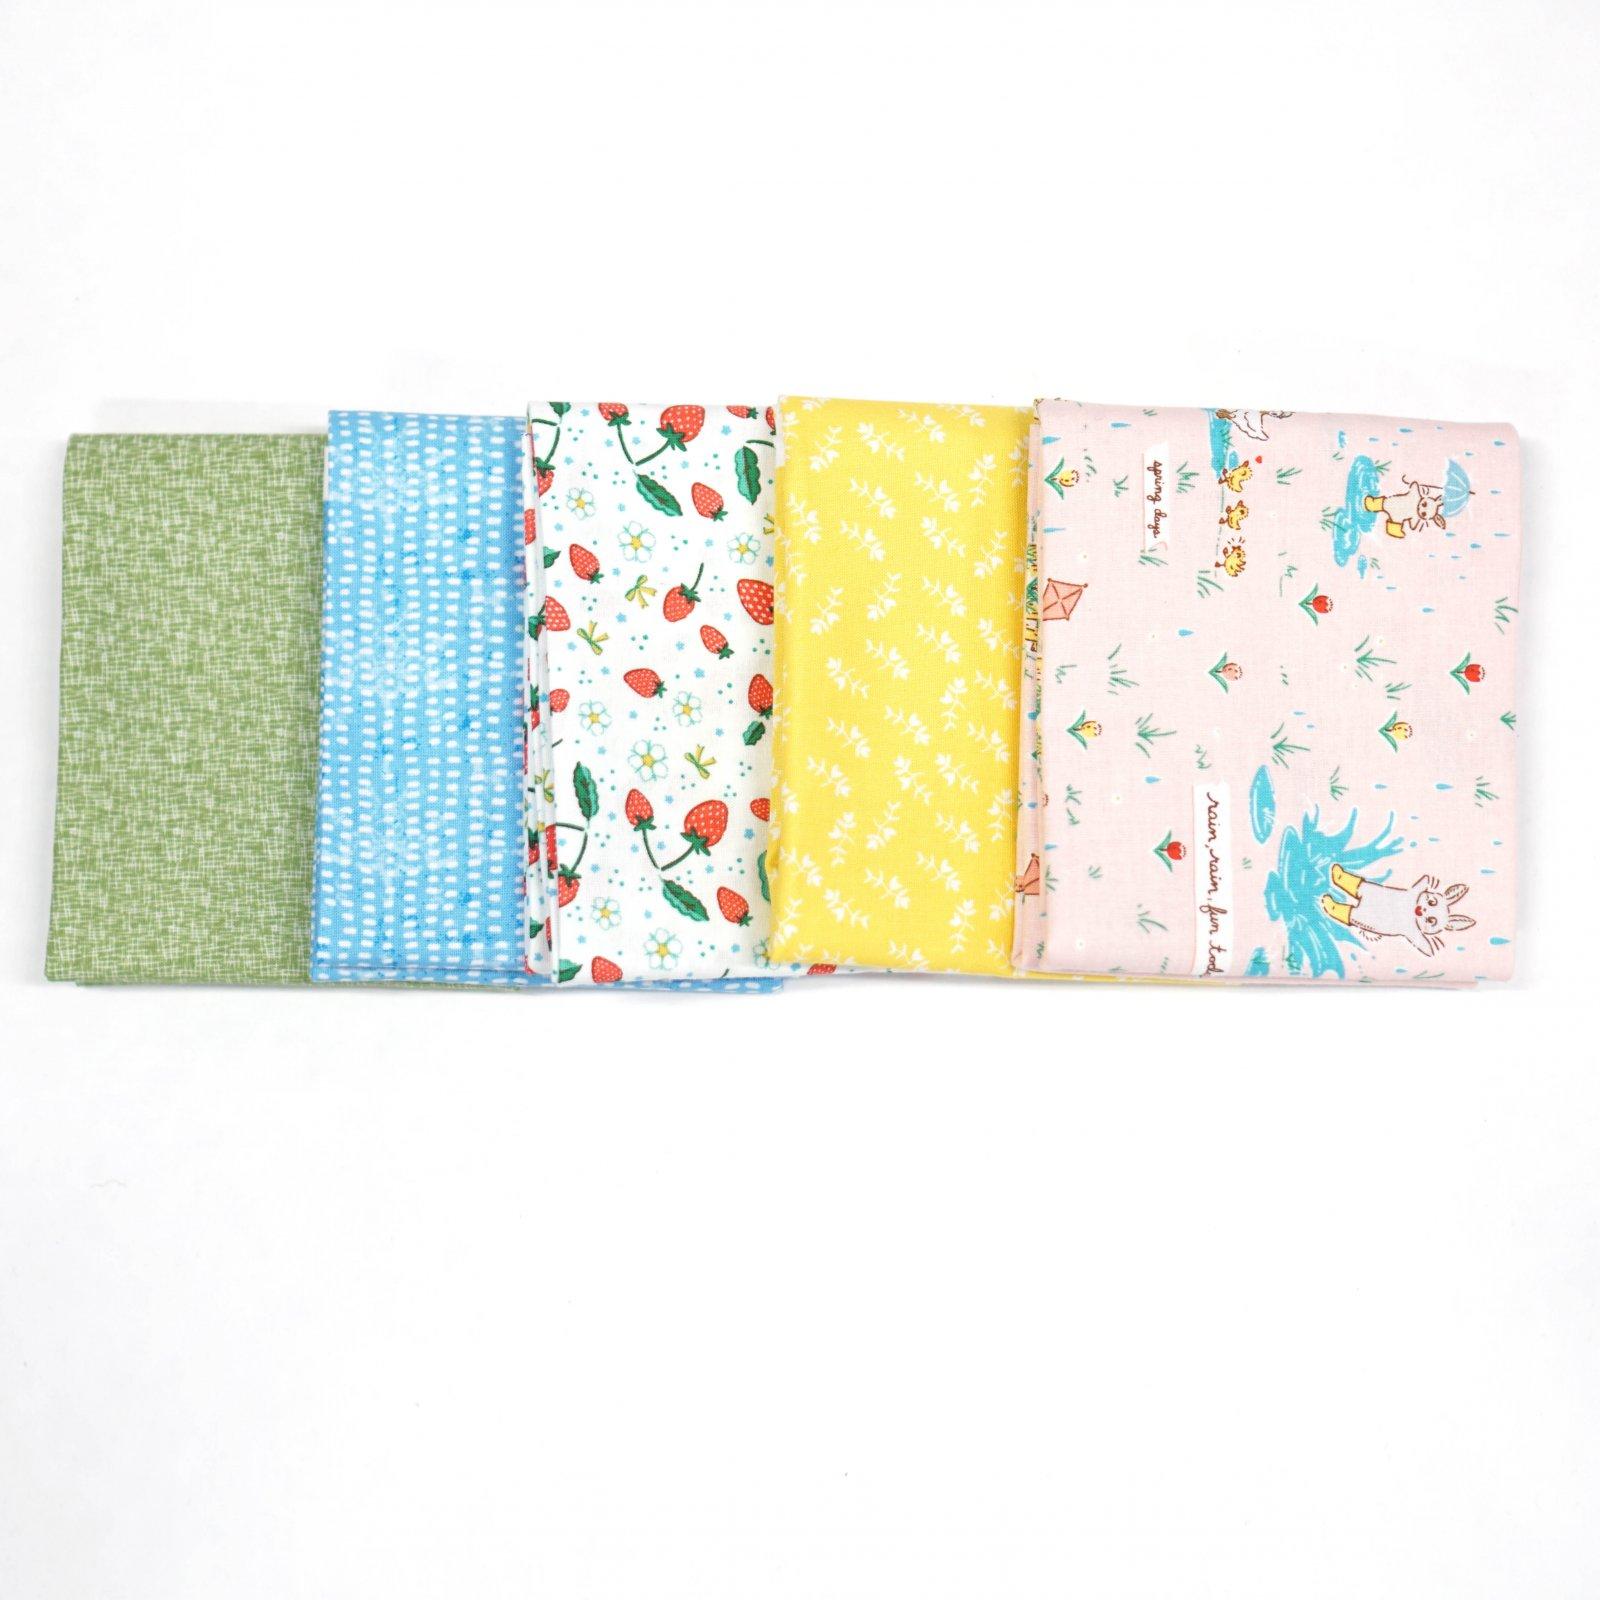 April Rains... - Crosscut Sewing Custom Bundle - (5) Half Yards